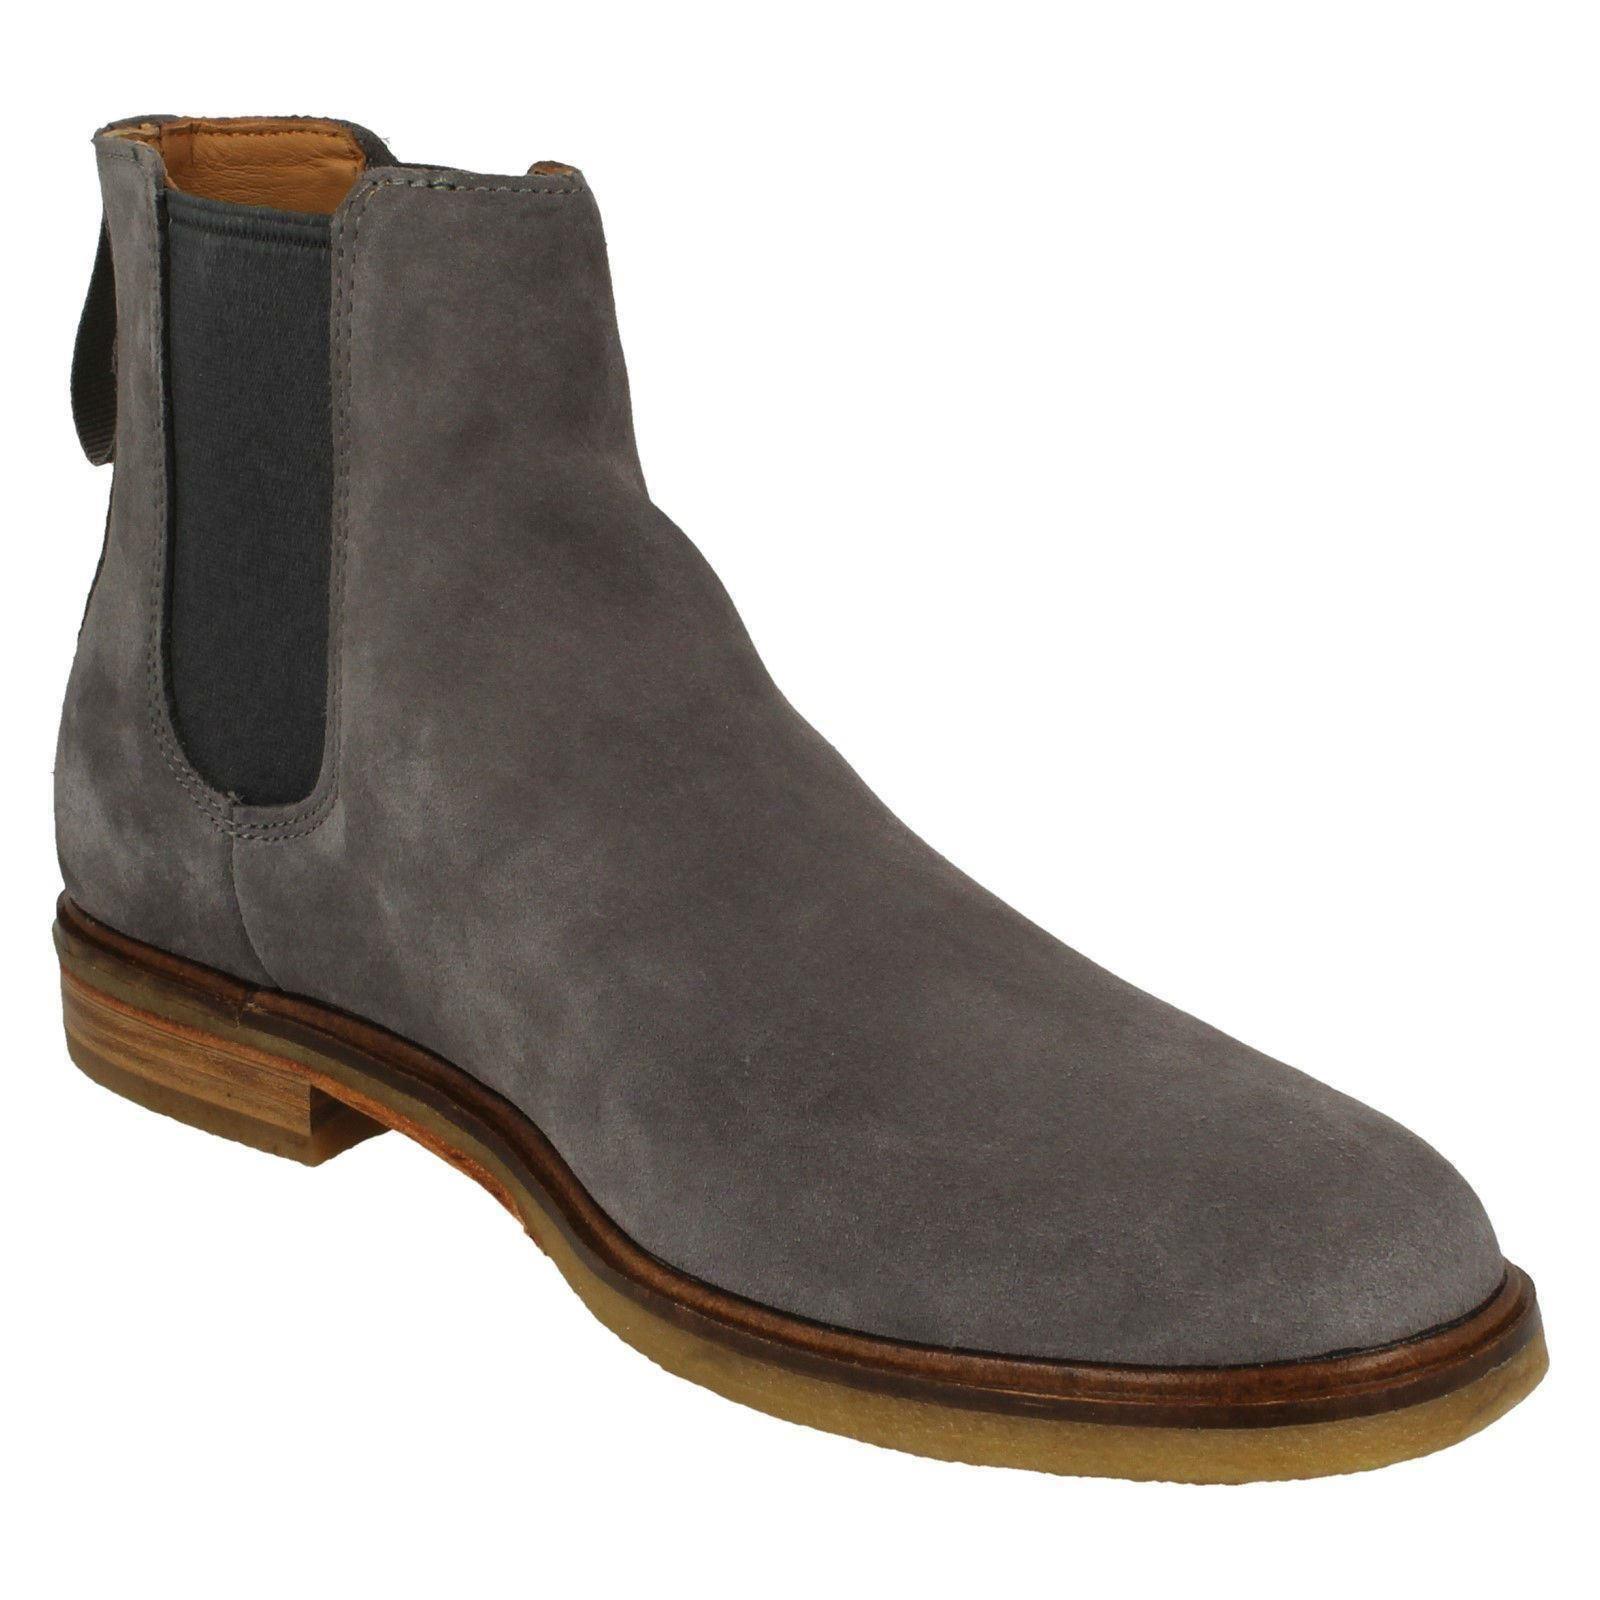 Mens Mens Mens Clarks Chelsea Boots 'Clarkdale Gobi' a619ff